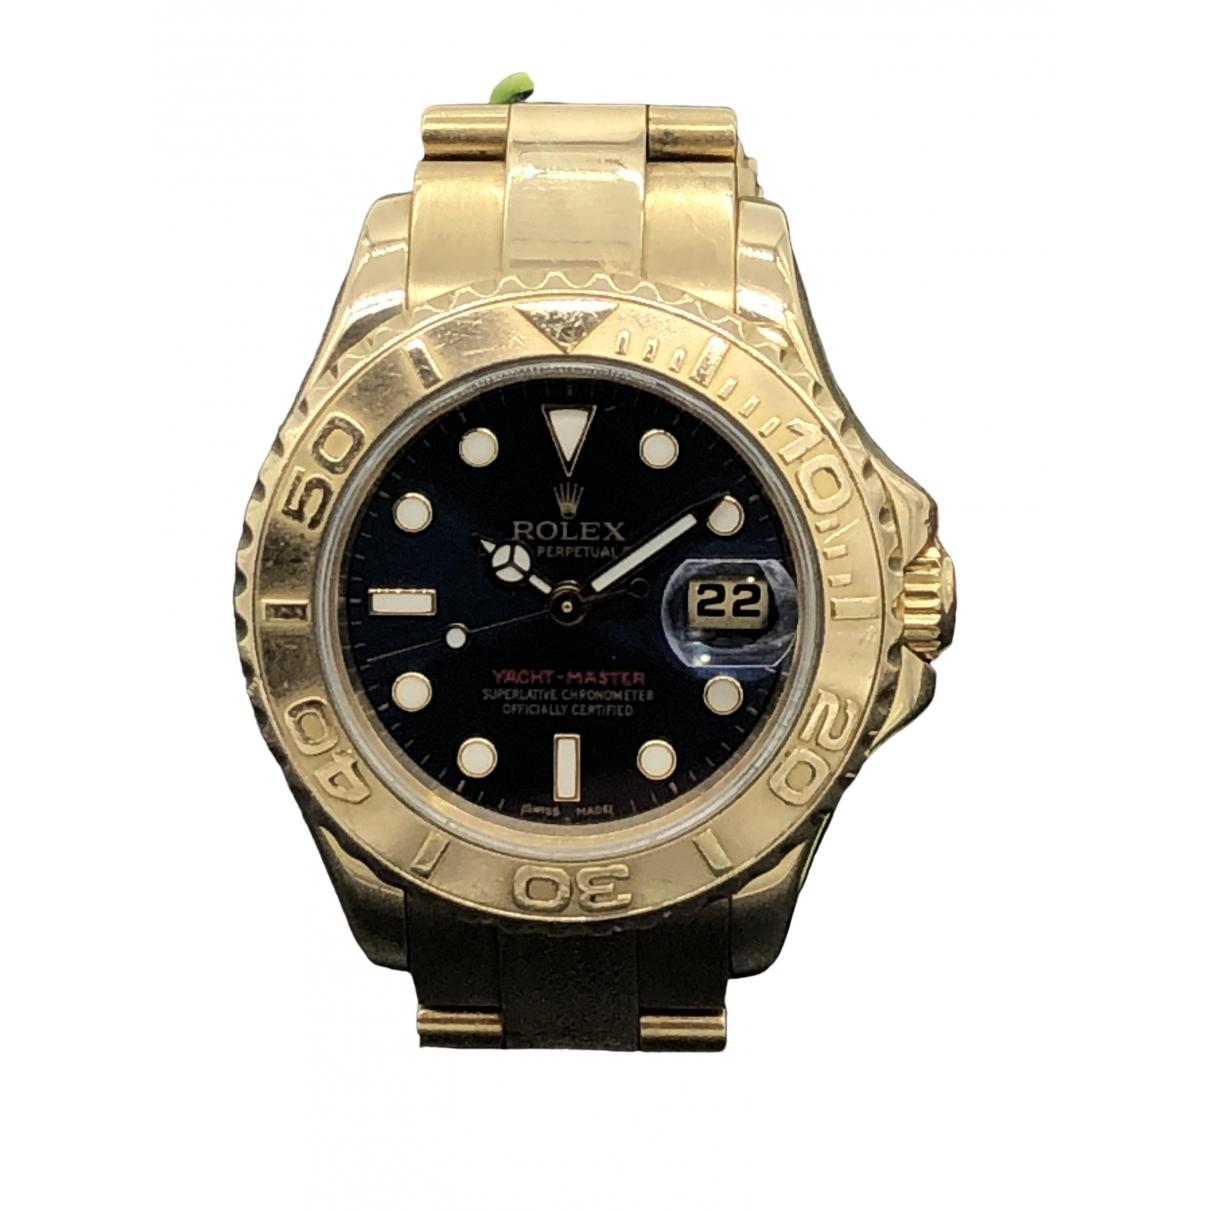 Rolex Yacht-Master Yellow Yellow gold watch for Women \N